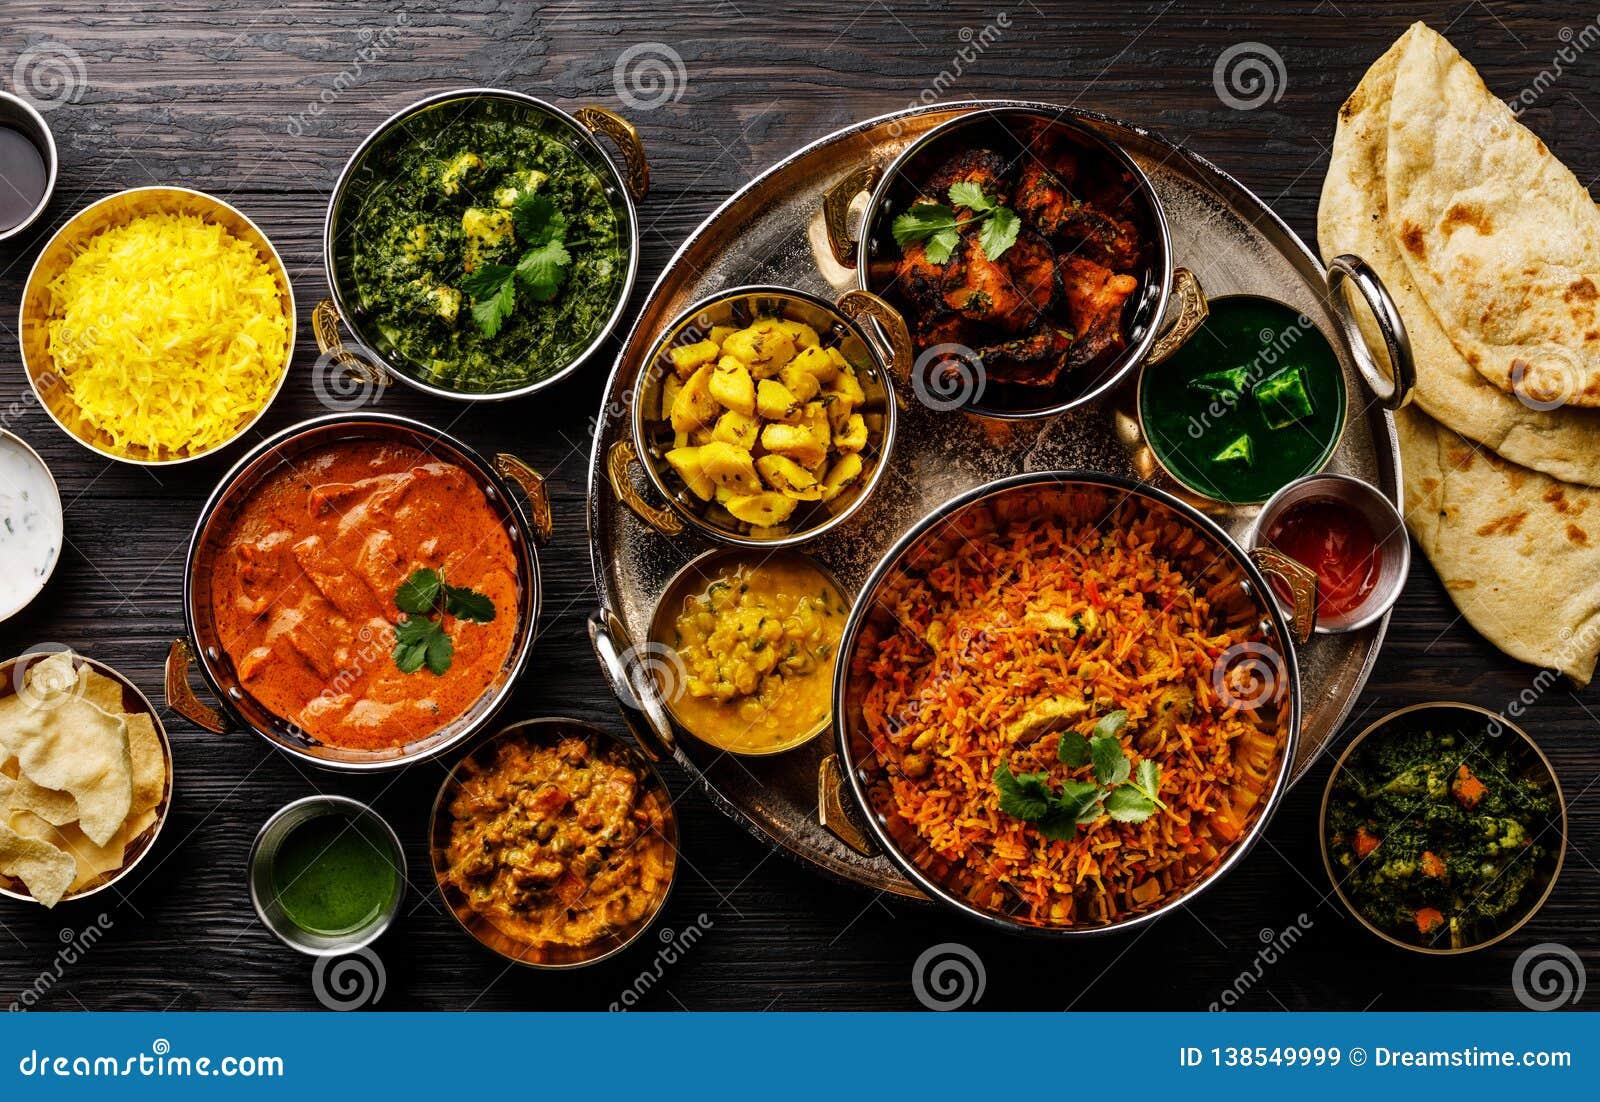 Pollo indio de la mantequilla del curry de la comida, Palak Paneer, Chiken Tikka, Biryani, curry vegetal, Papad, Dal, Palak Sabji